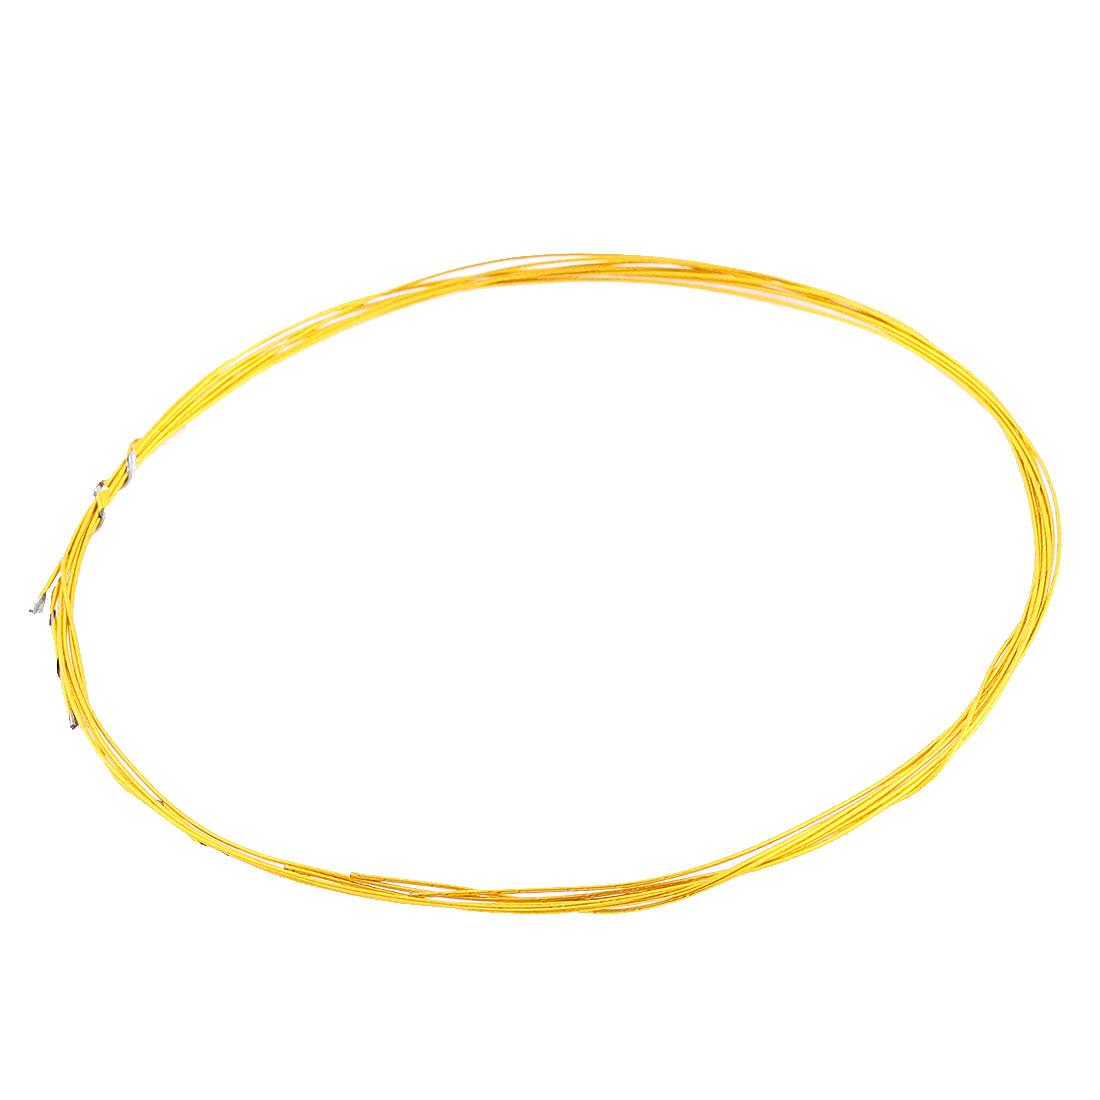 Dress Headdress Flower DIY Craft Jewelry Wire Gold Tone 1mm Dia 80cm 4 Pcs